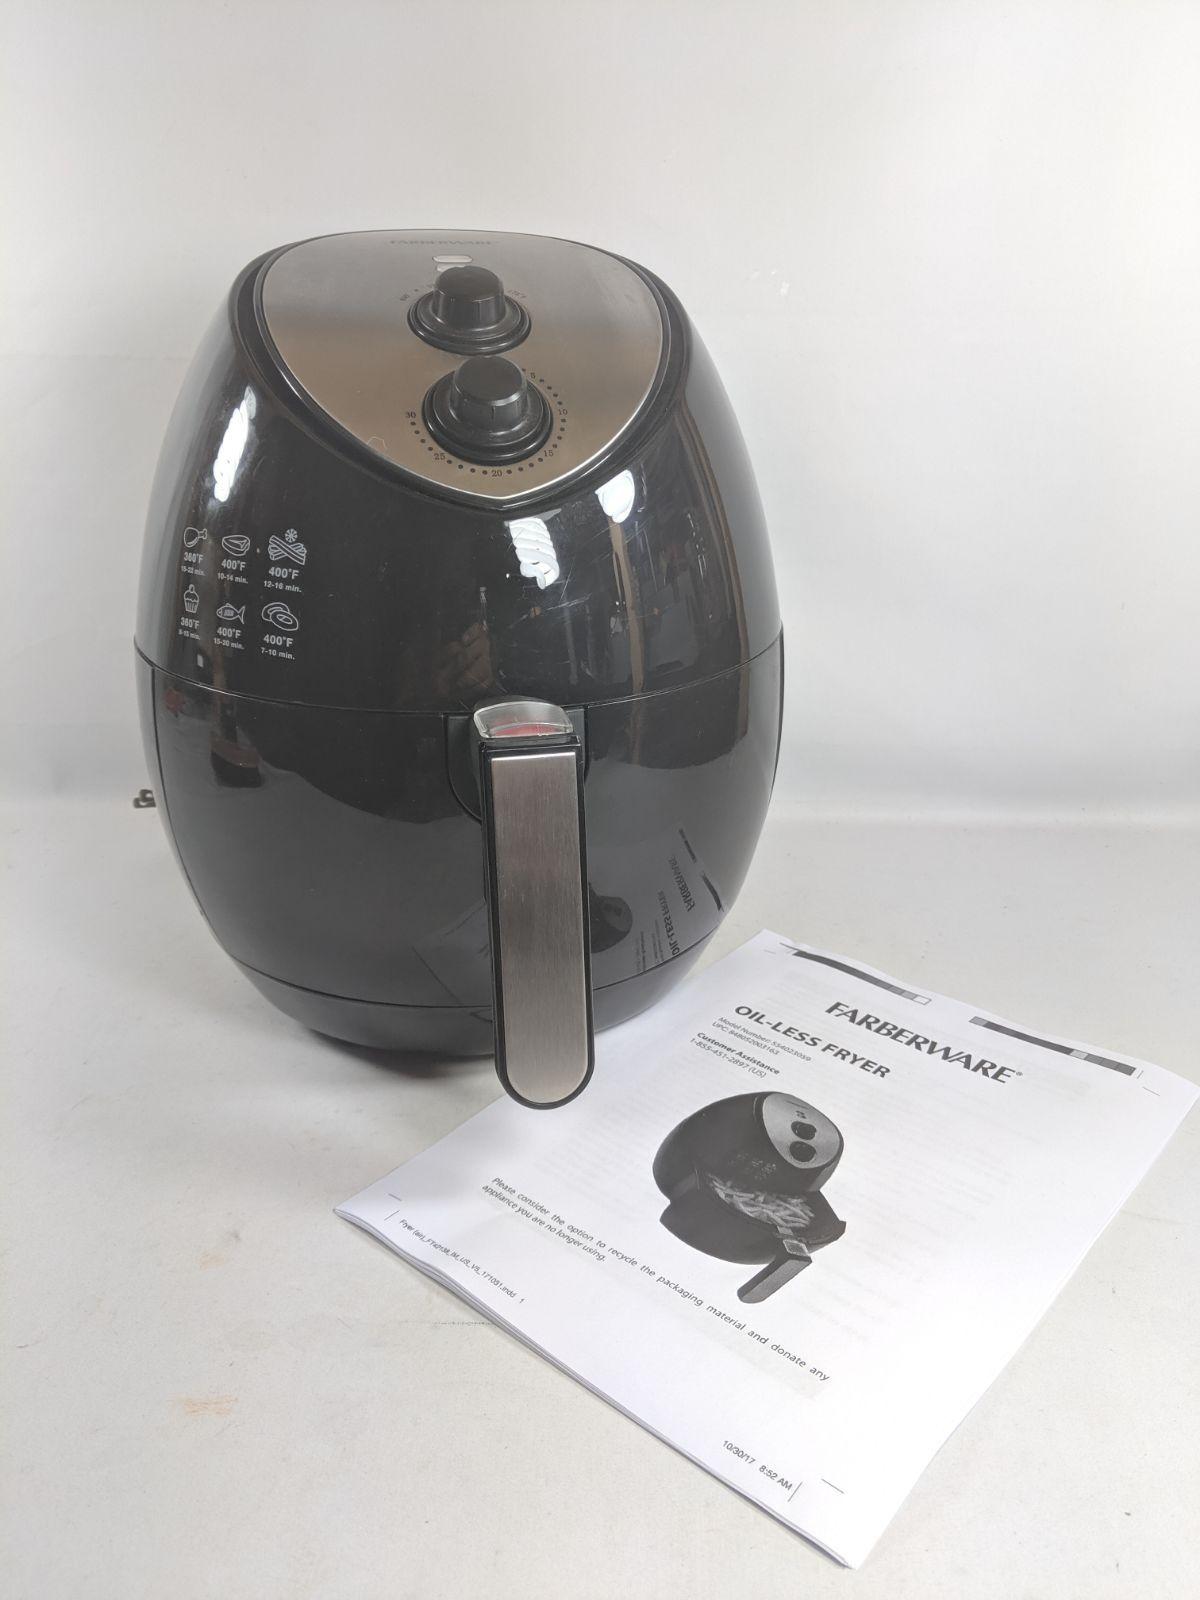 Farberware Air Fryer 3.2 qt. OilLess Mercari airfryer